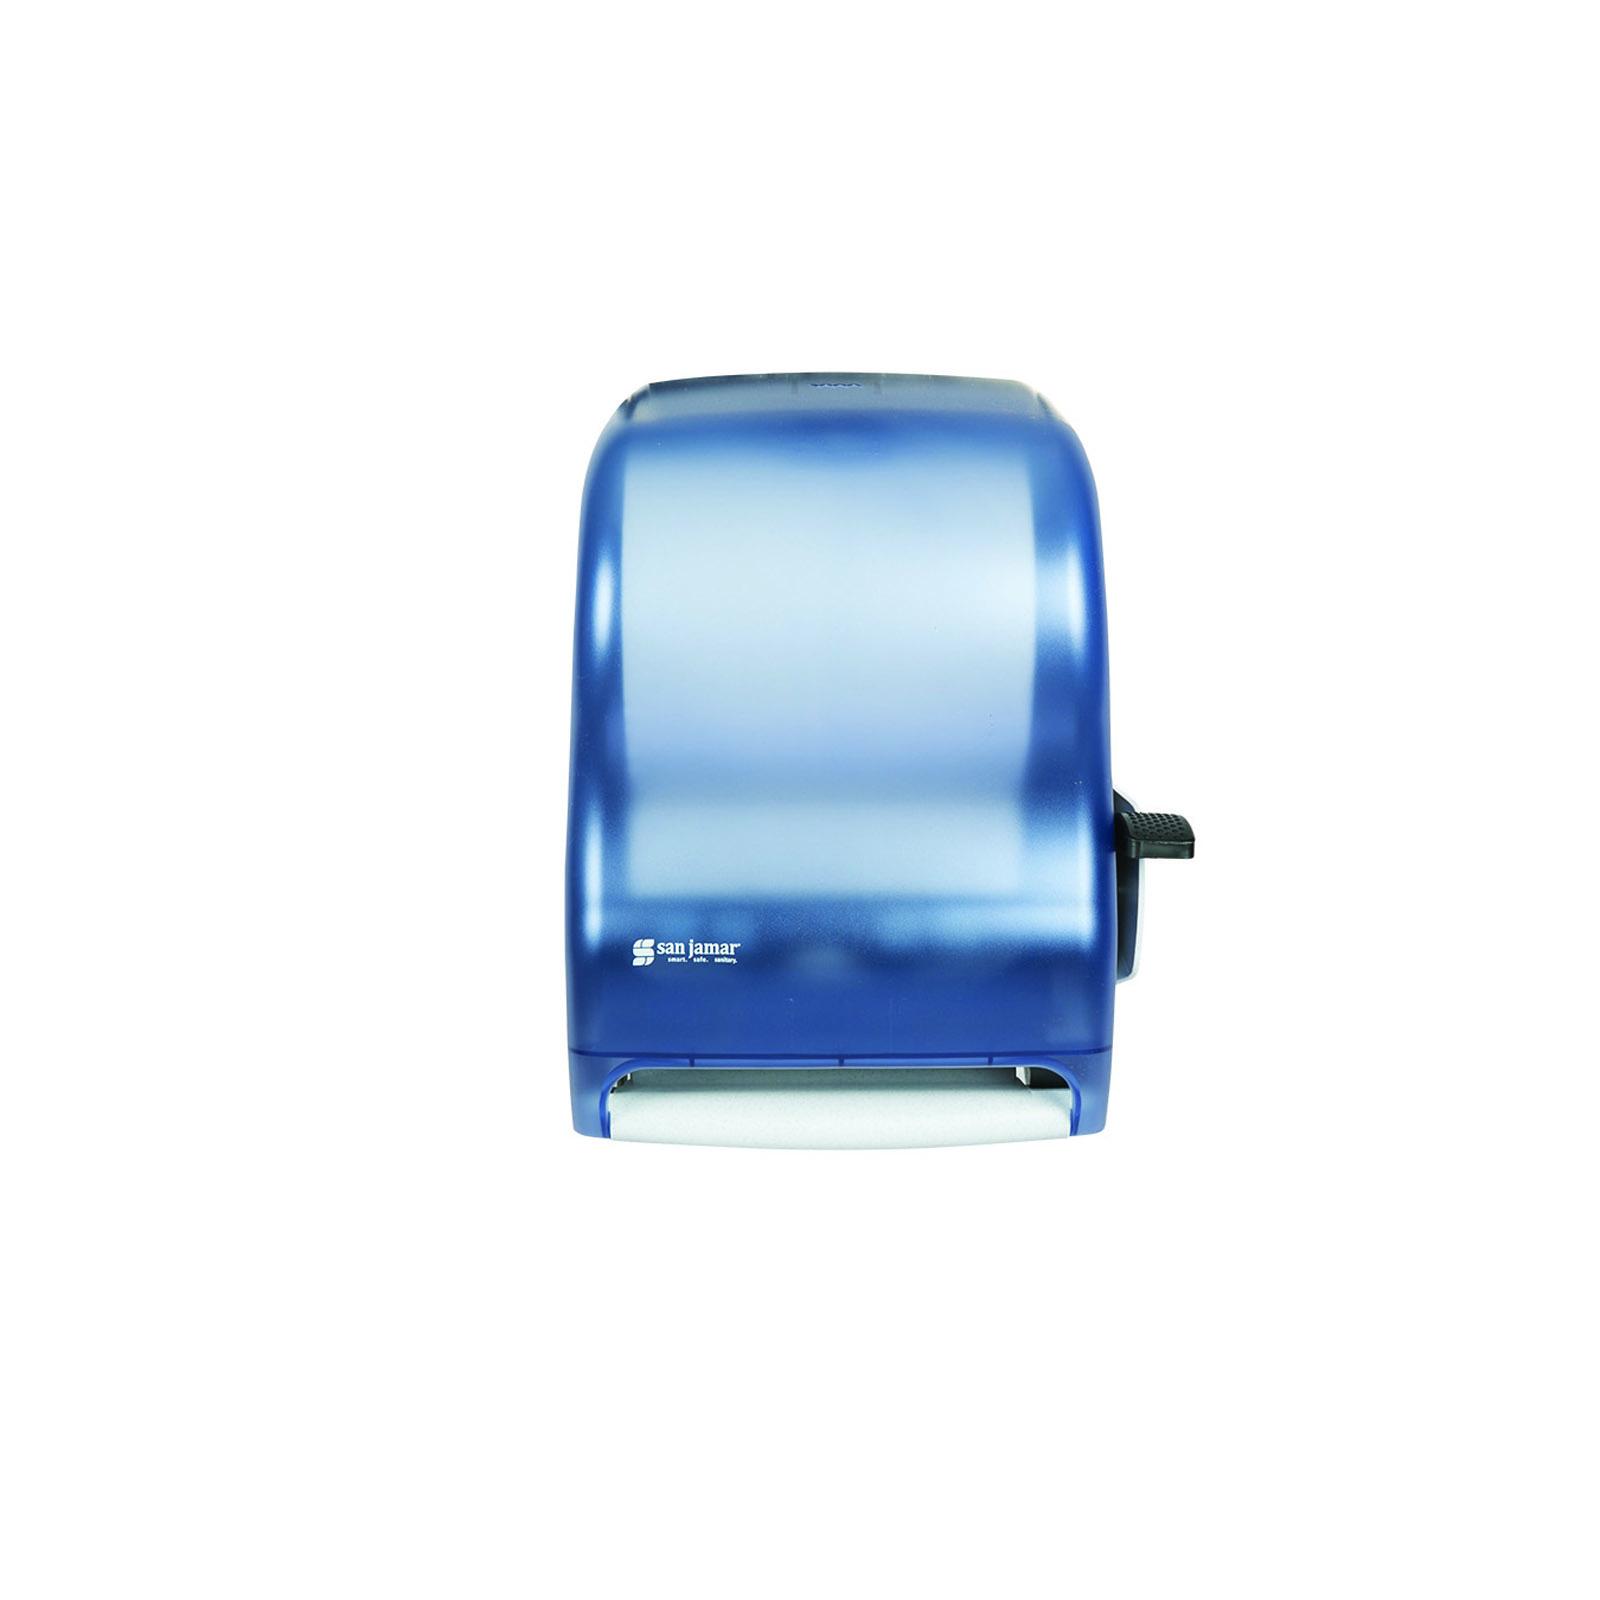 San Jamar T1100TBL paper towel dispenser